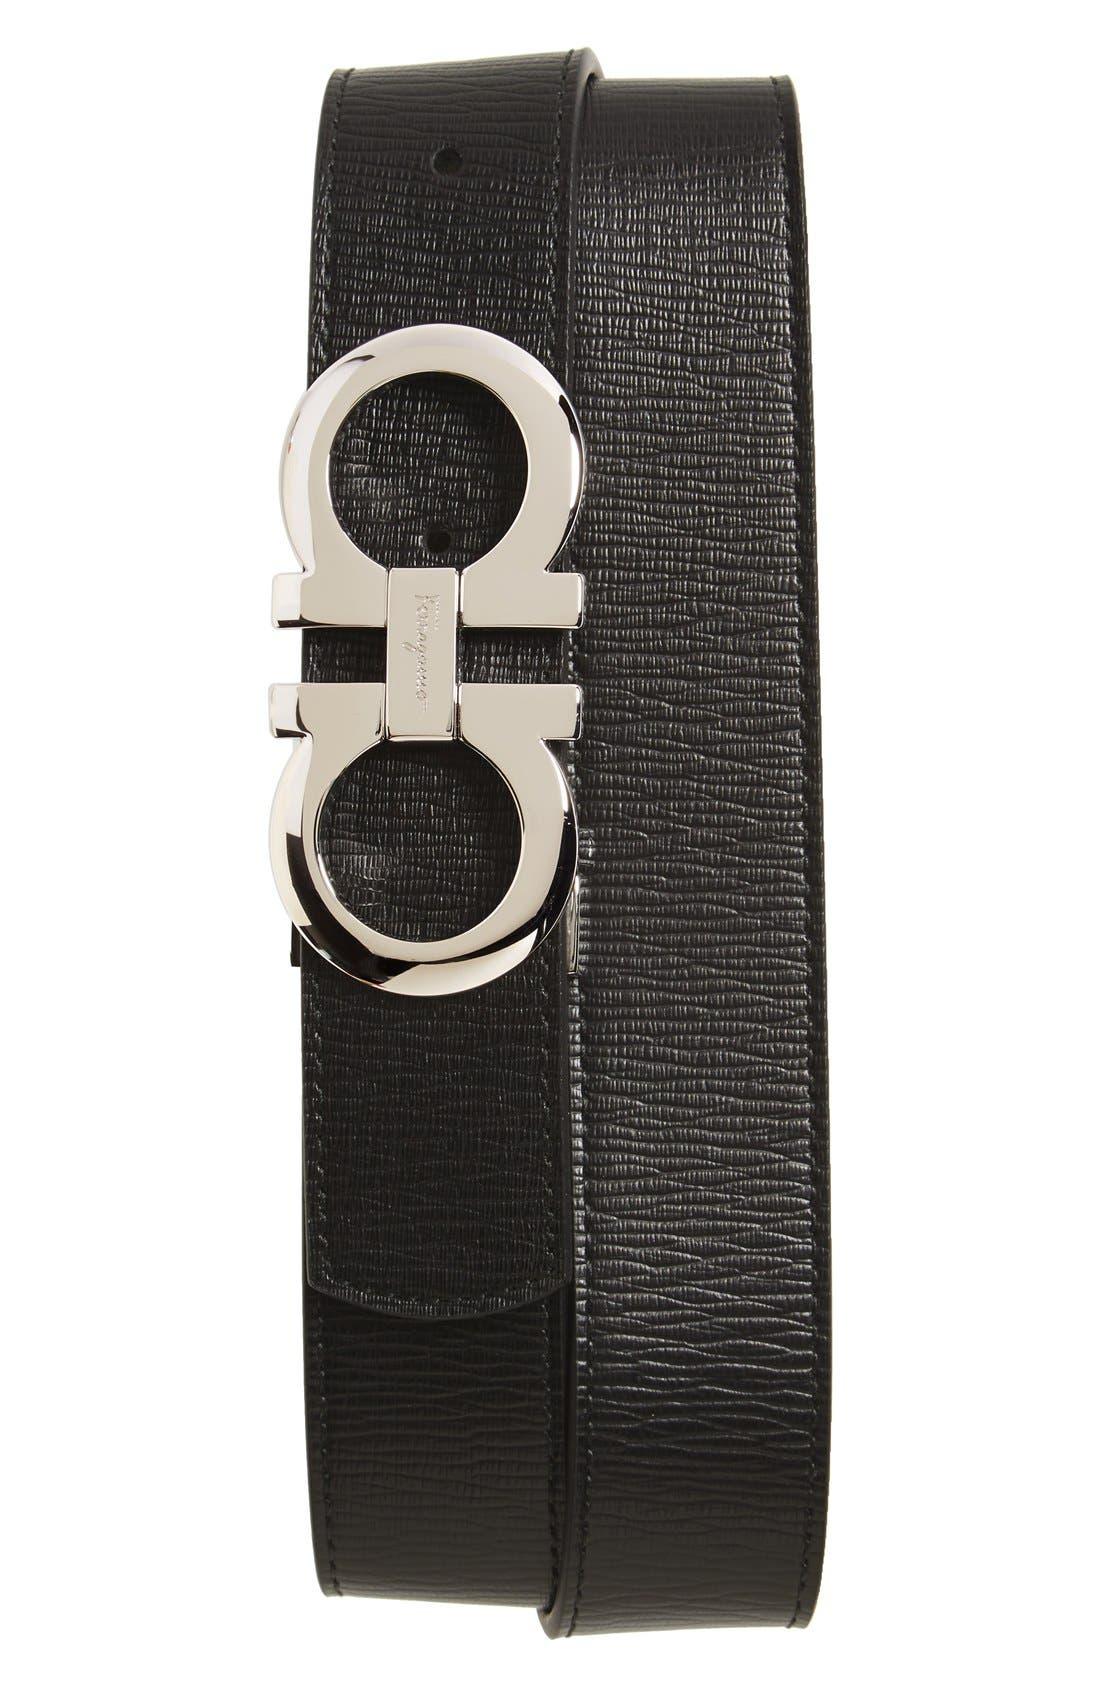 SALVATORE FERRAGAMO, Revival Reversible Leather Belt, Main thumbnail 1, color, BLACK/BROWN